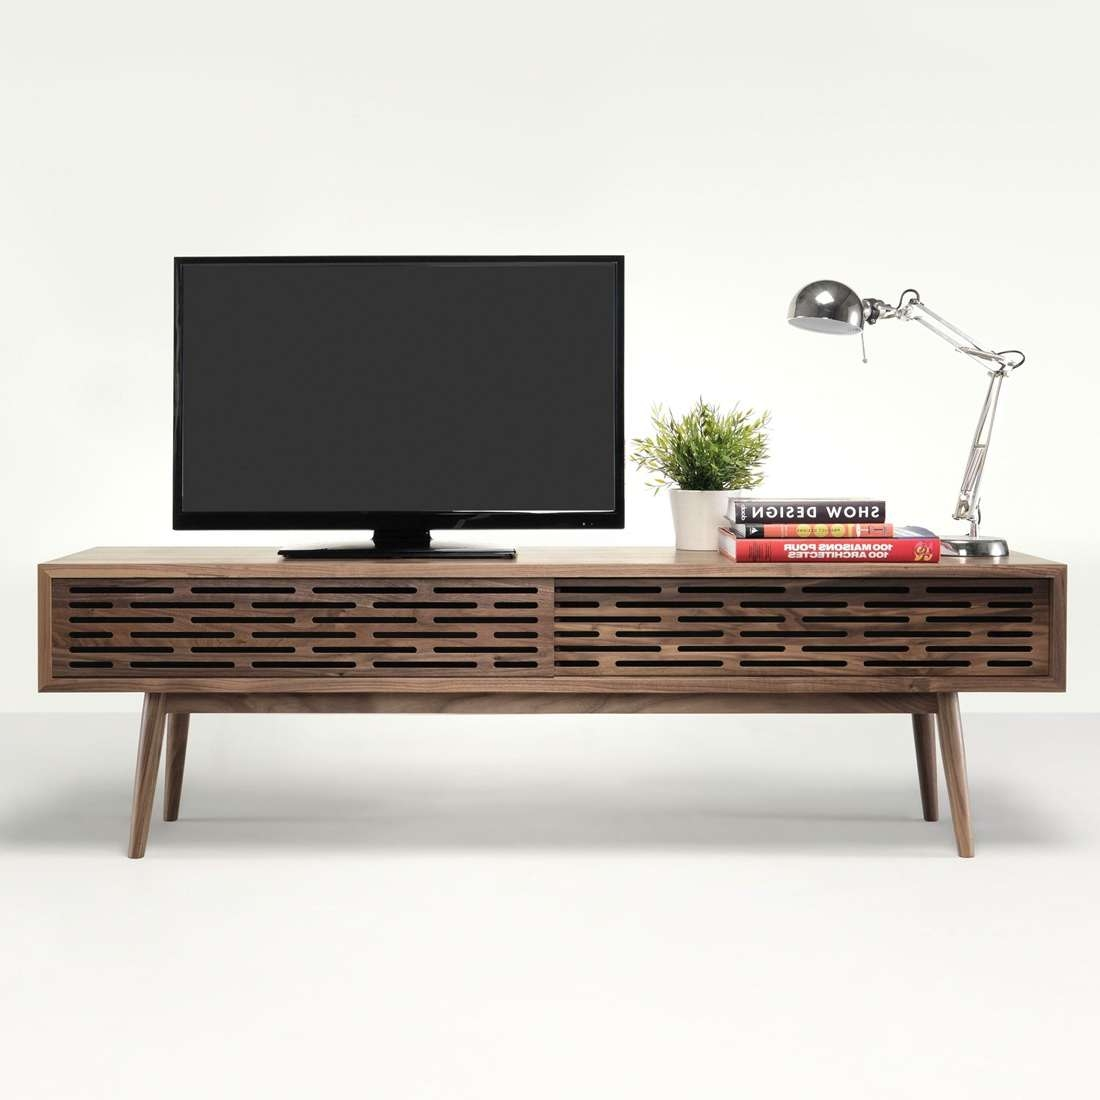 We Wood Radio Solid Walnut Tv Cabinet | Radio Solid Walnut Tv Within Walnut Tv Cabinets (View 11 of 20)